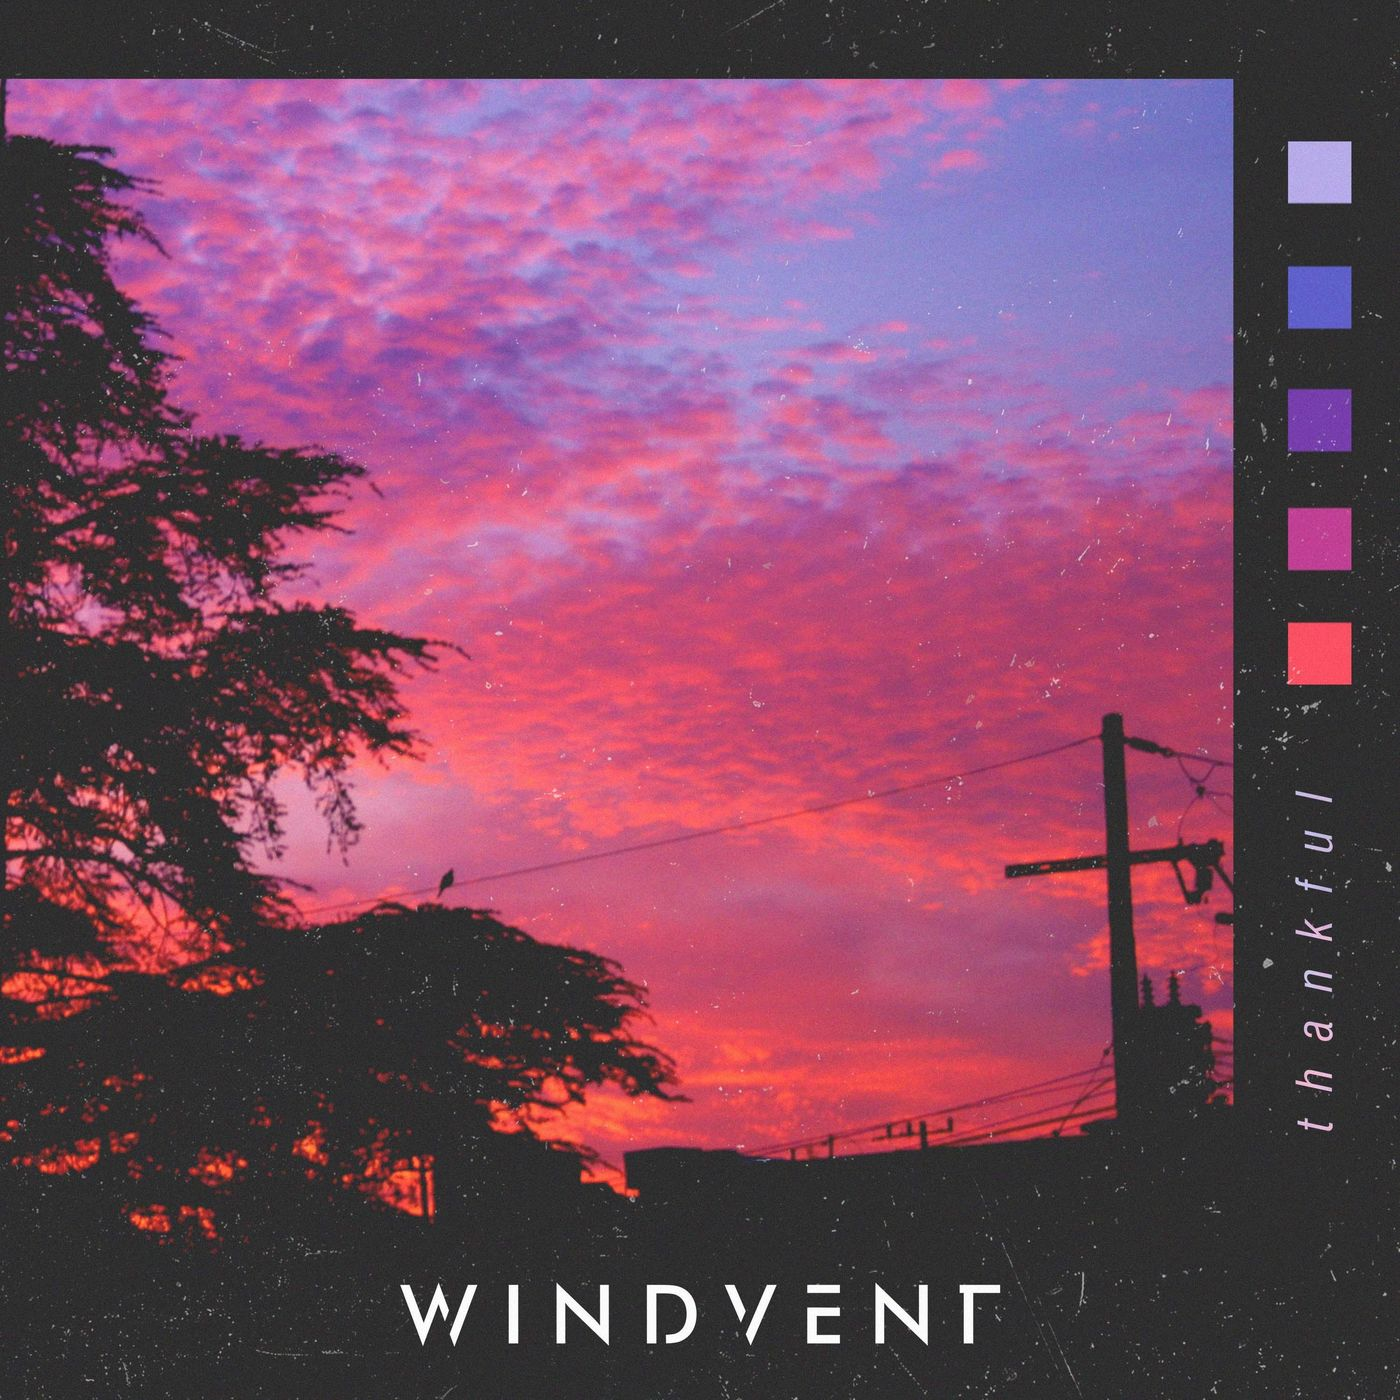 Windvent - Thankful [single] (2020)